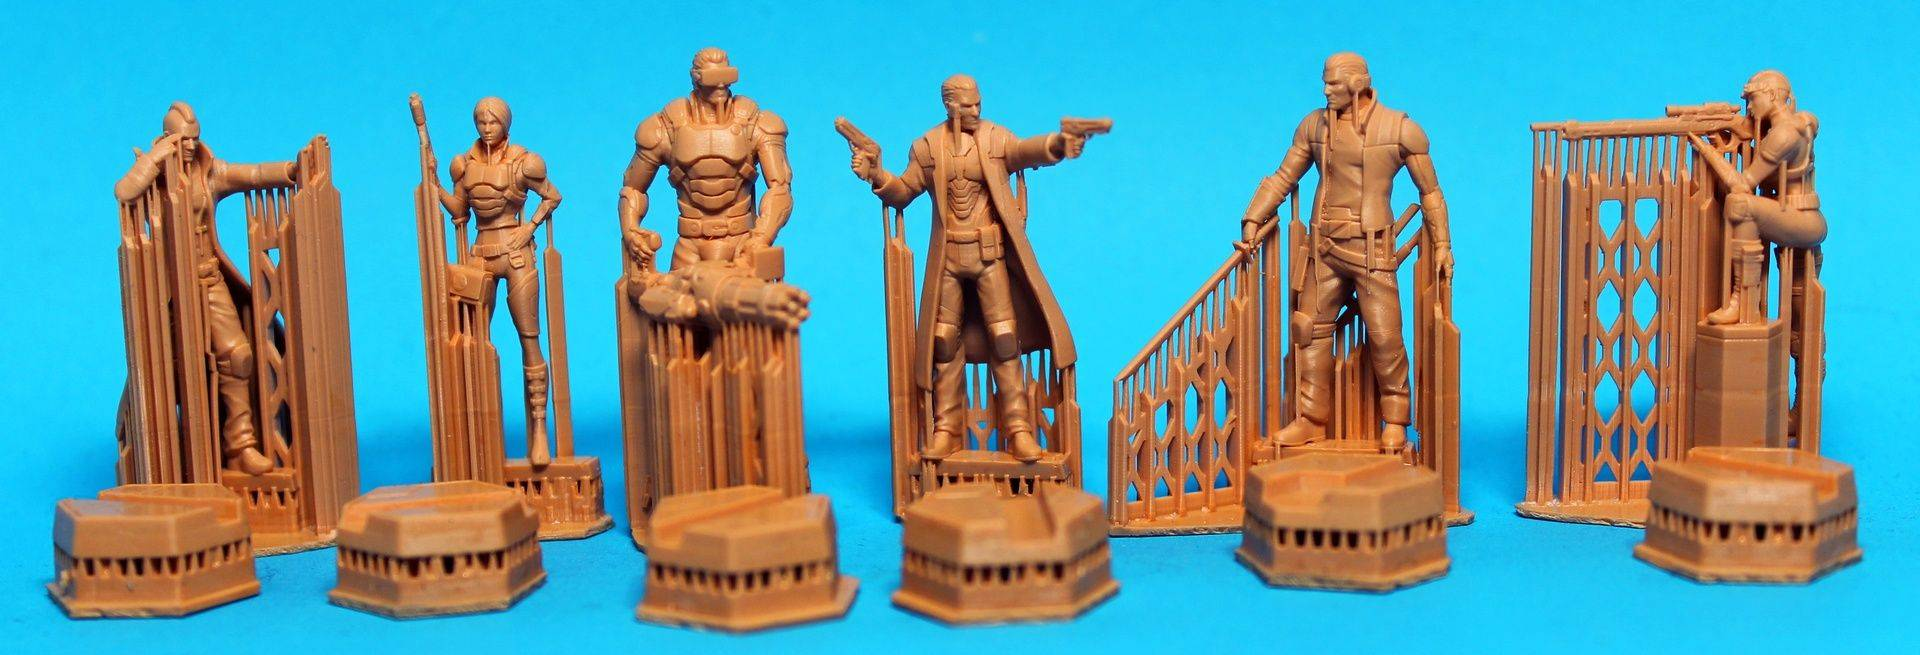 3D Print - 3D Sculpt - HD Resin Cast... and Paint Miniatures! Crowdfunding Manager Online Store